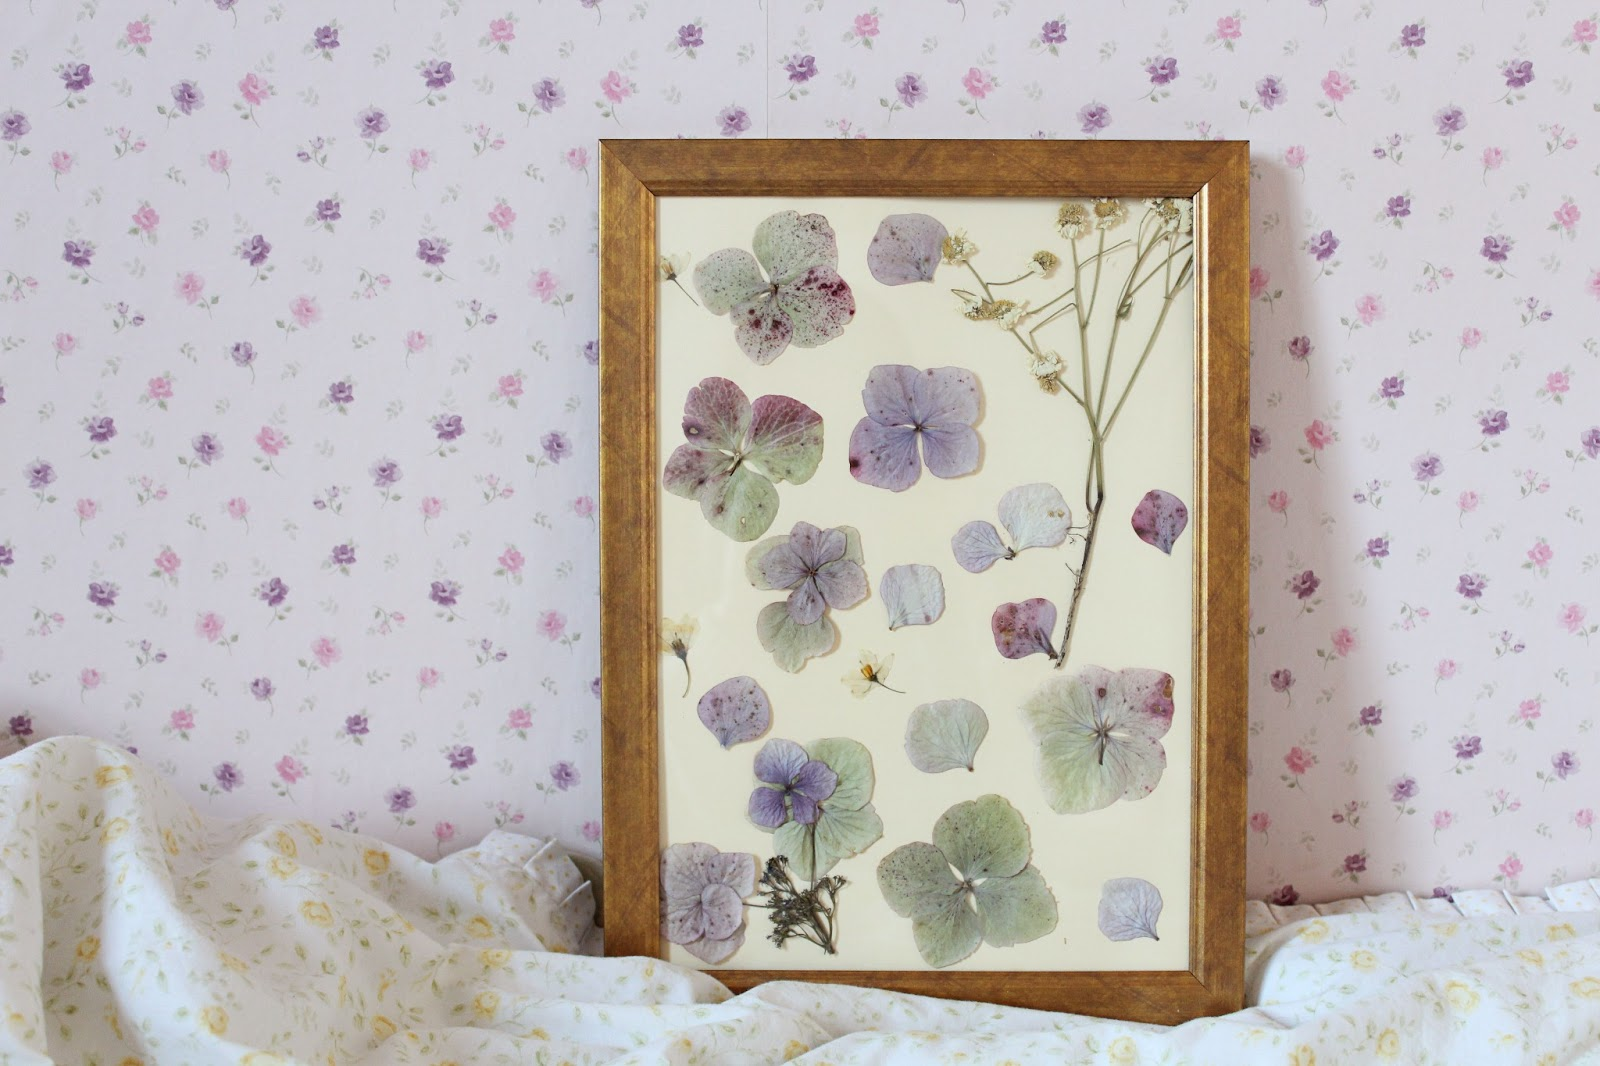 DIY: Pressed flower pictures | Gingerlillytea